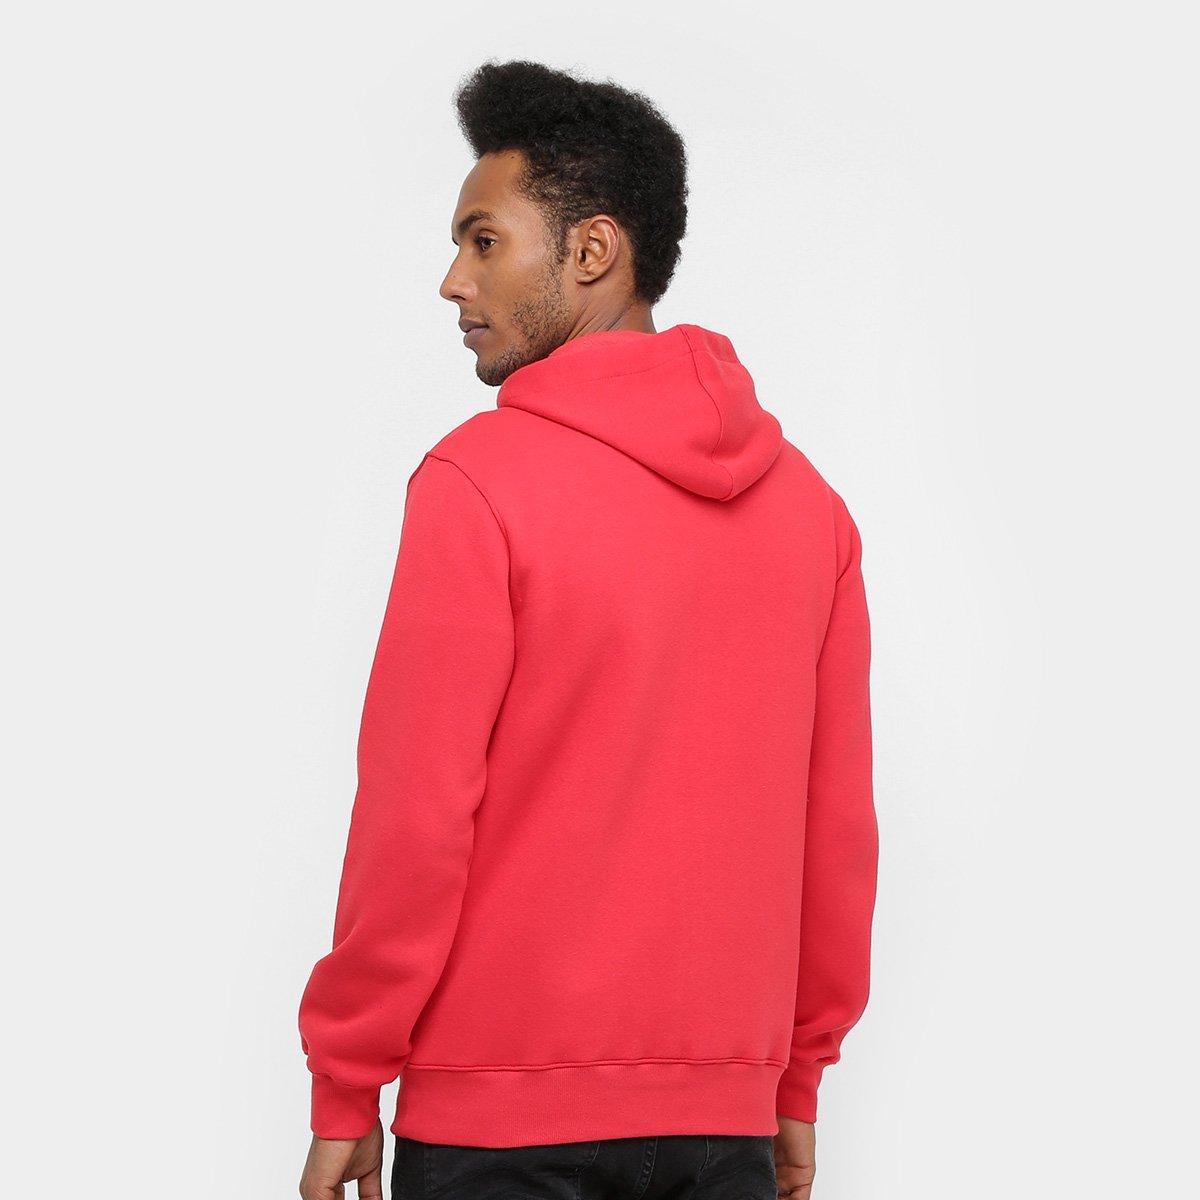 Moletom Oakley Mod One Brand Fzip Fleece Masculino - Compre Agora ... 934cb29c2b7